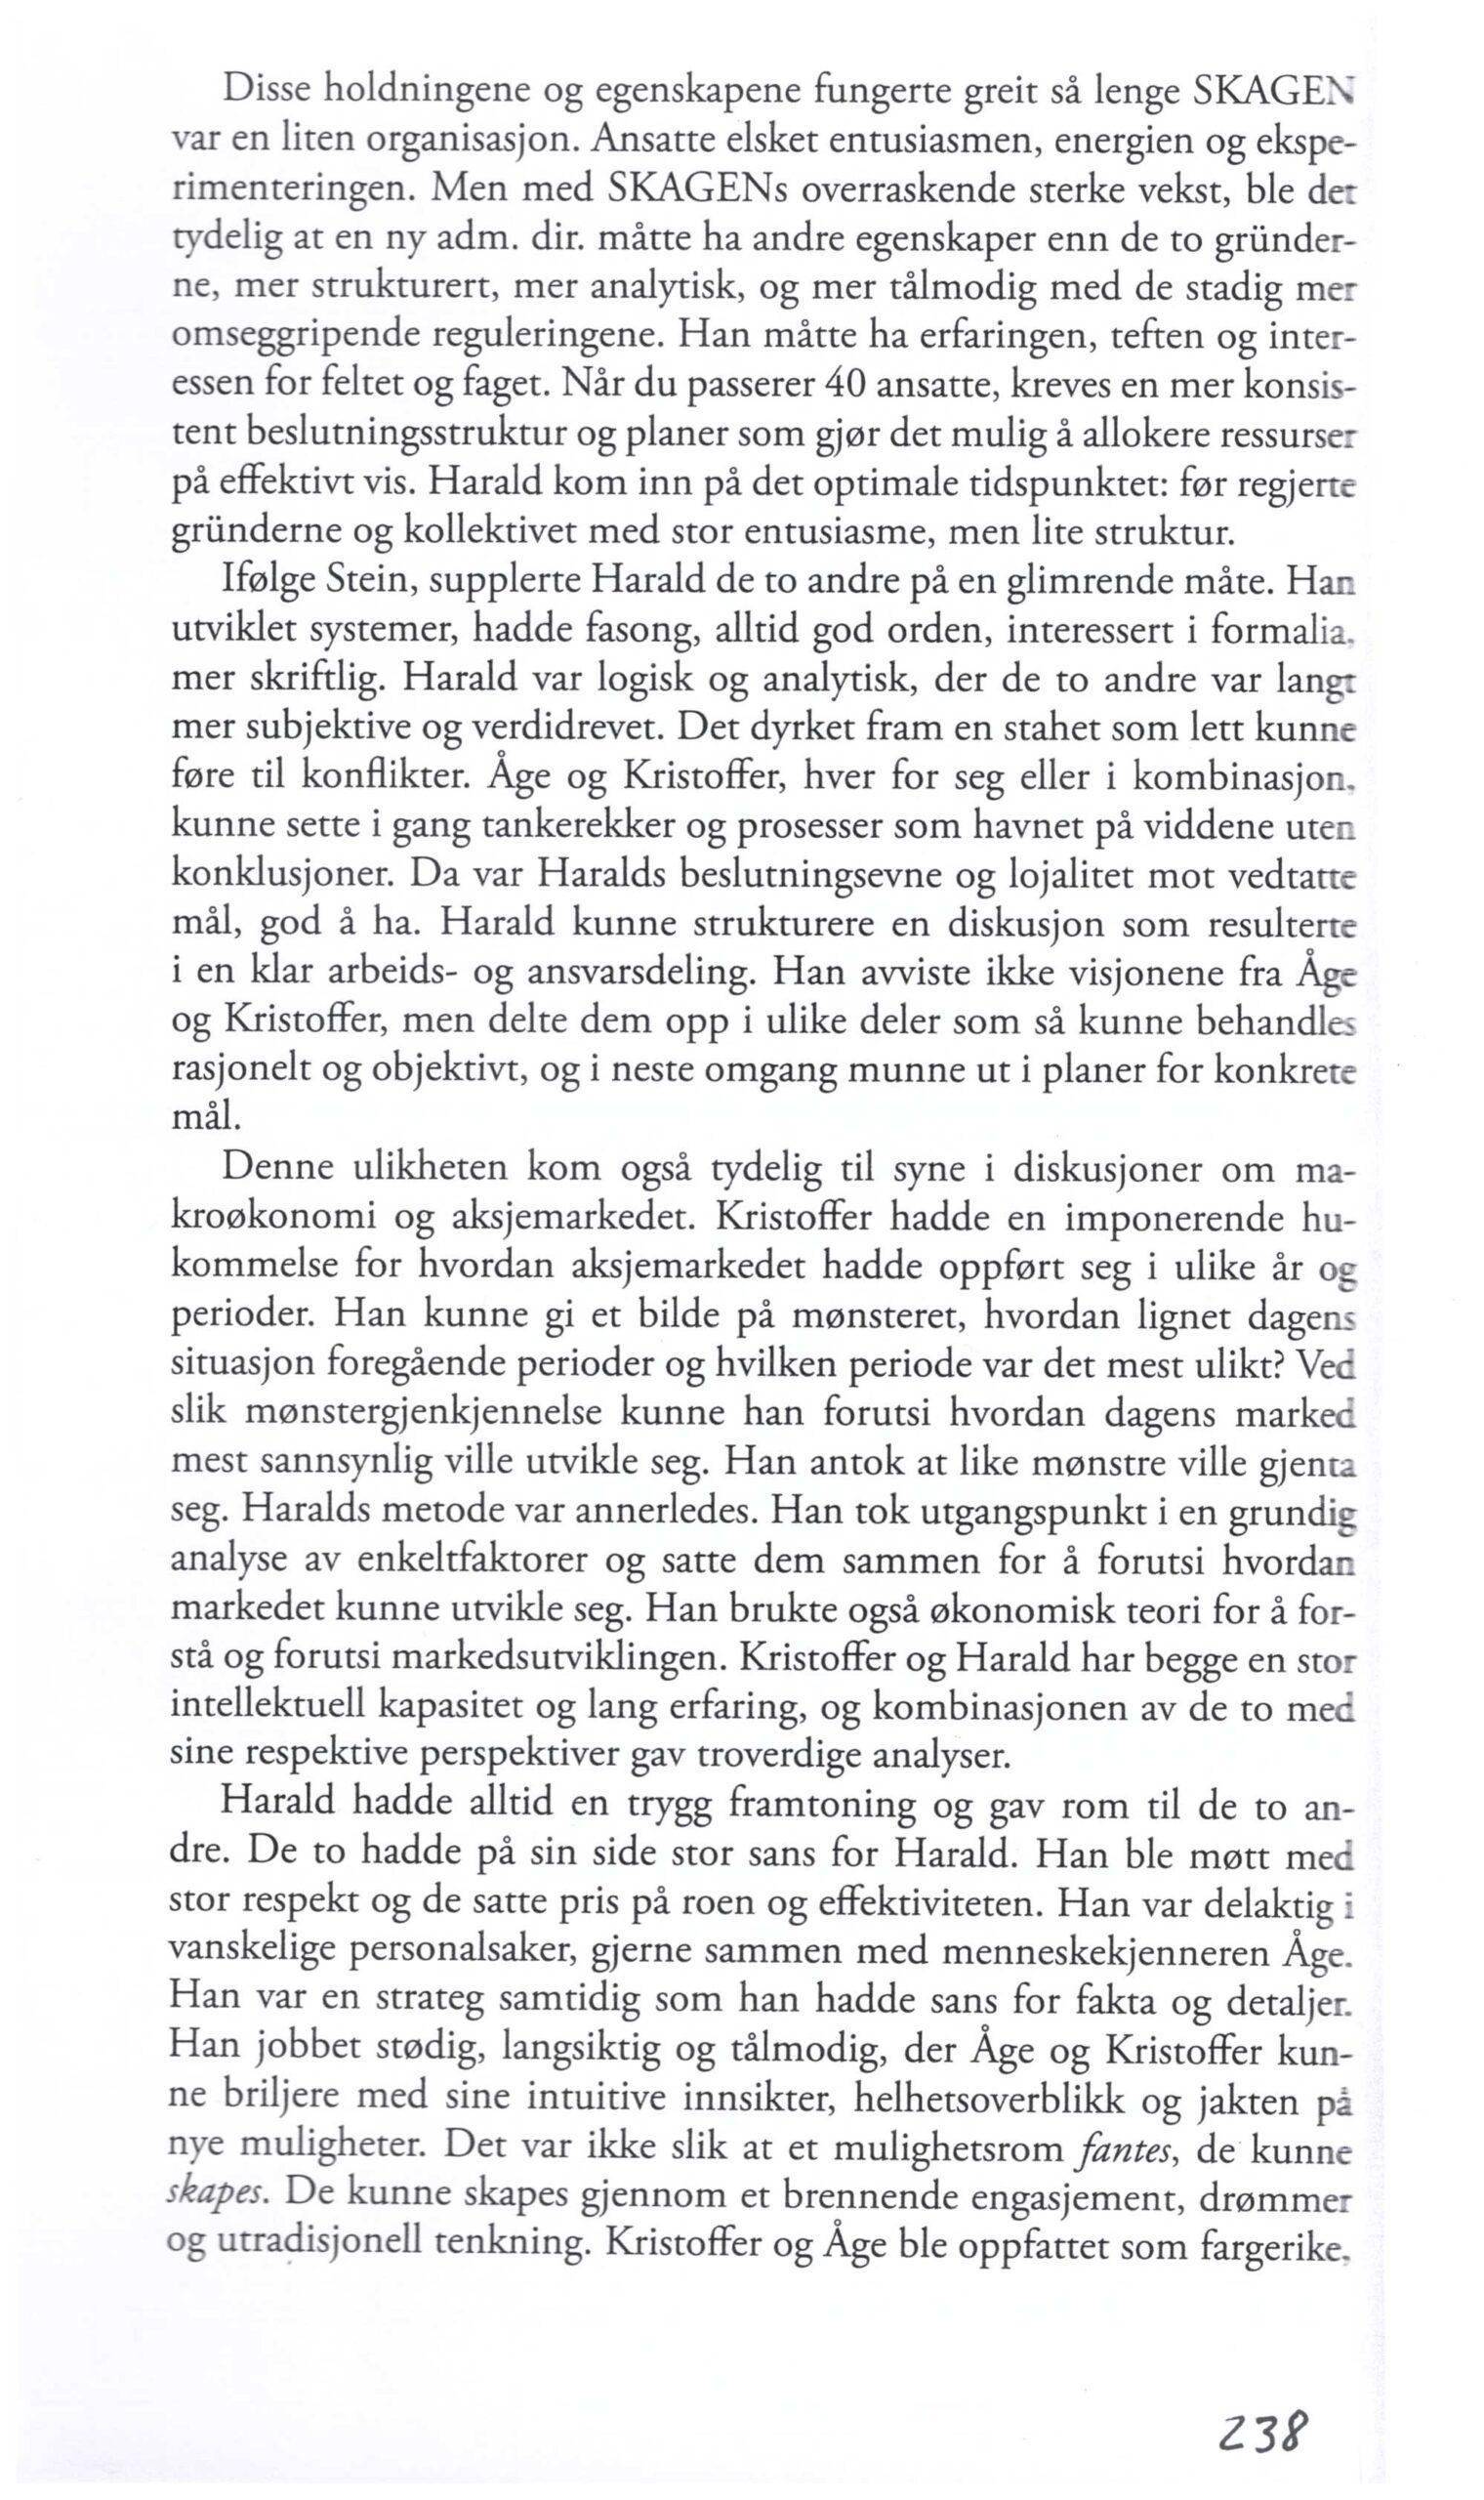 Skagen boka 3